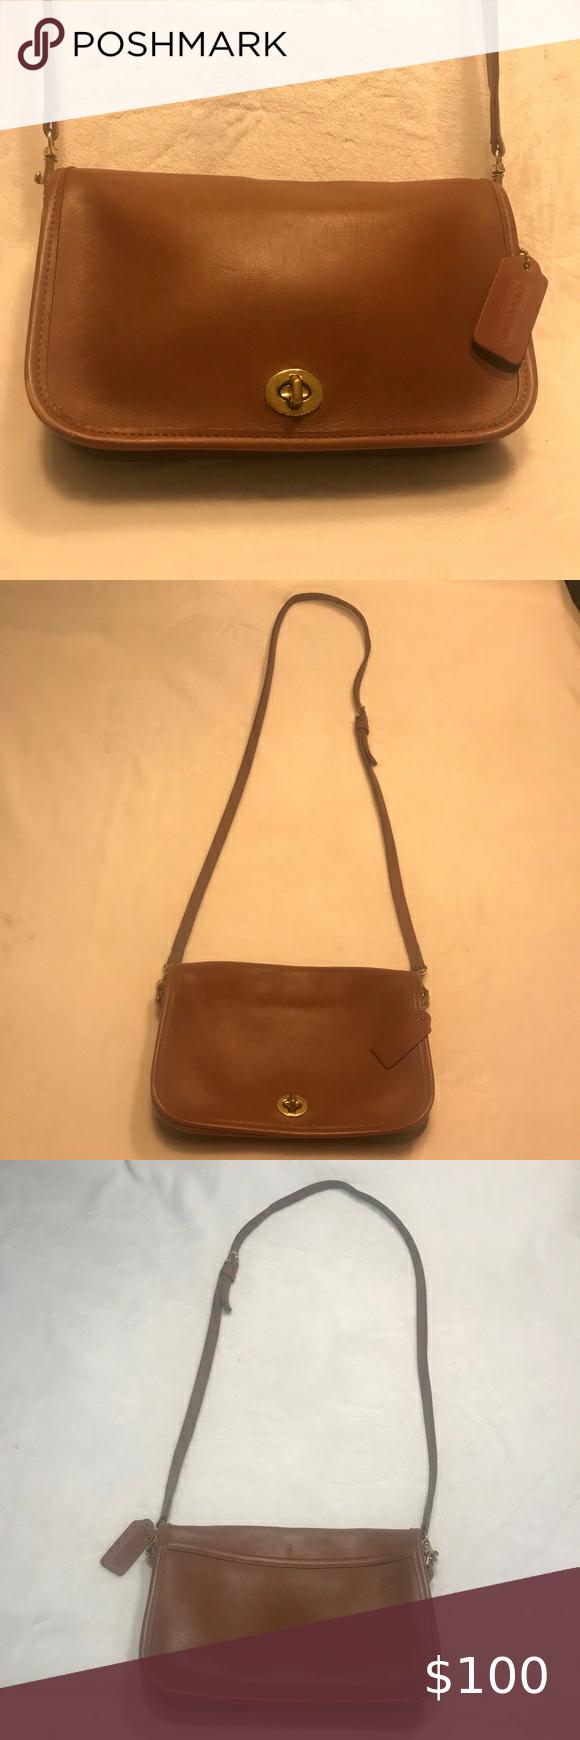 Coach Vintage Penny Pocket Purse Saddle Br…